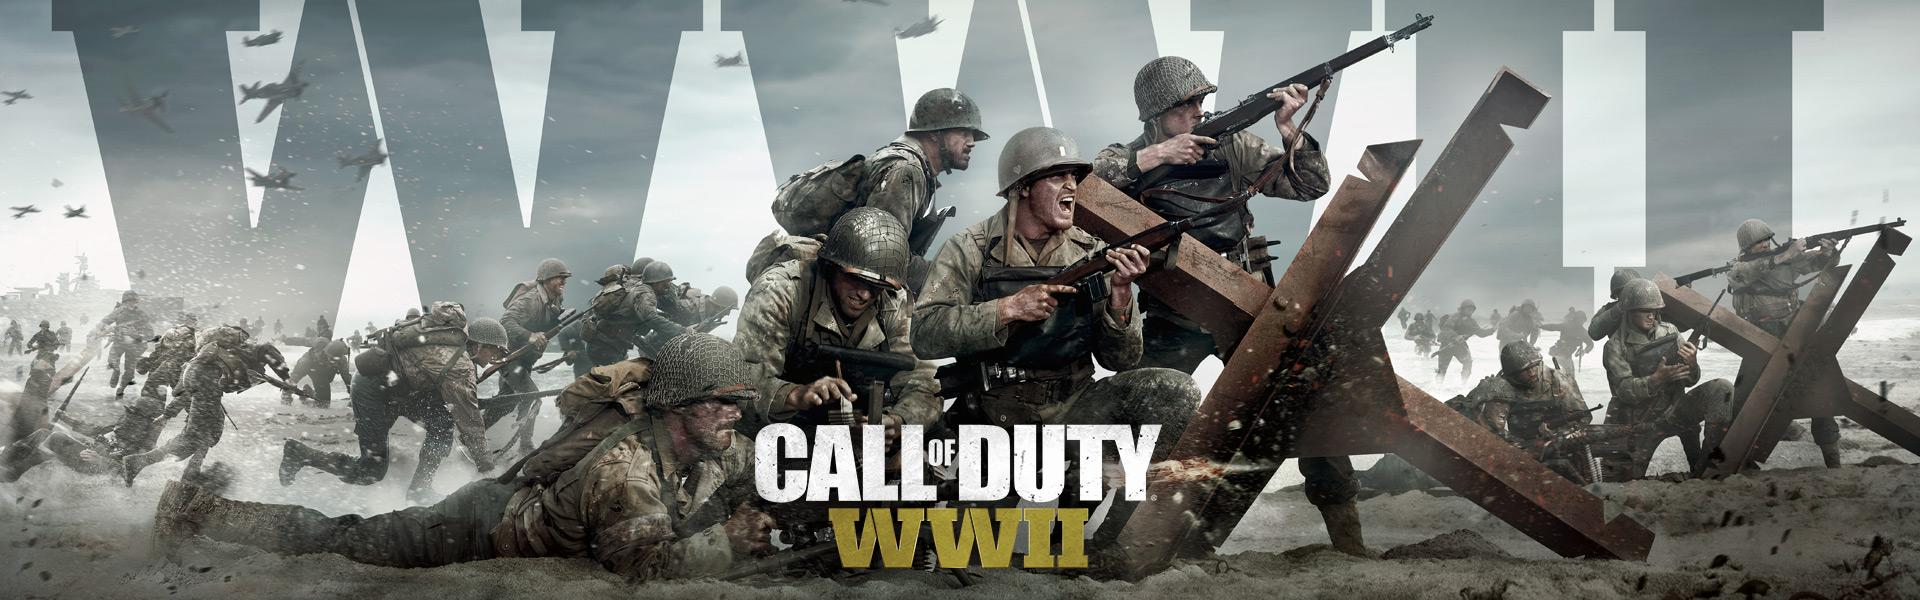 Создатели Call of Duty: WWII защитят геймеров от читеров